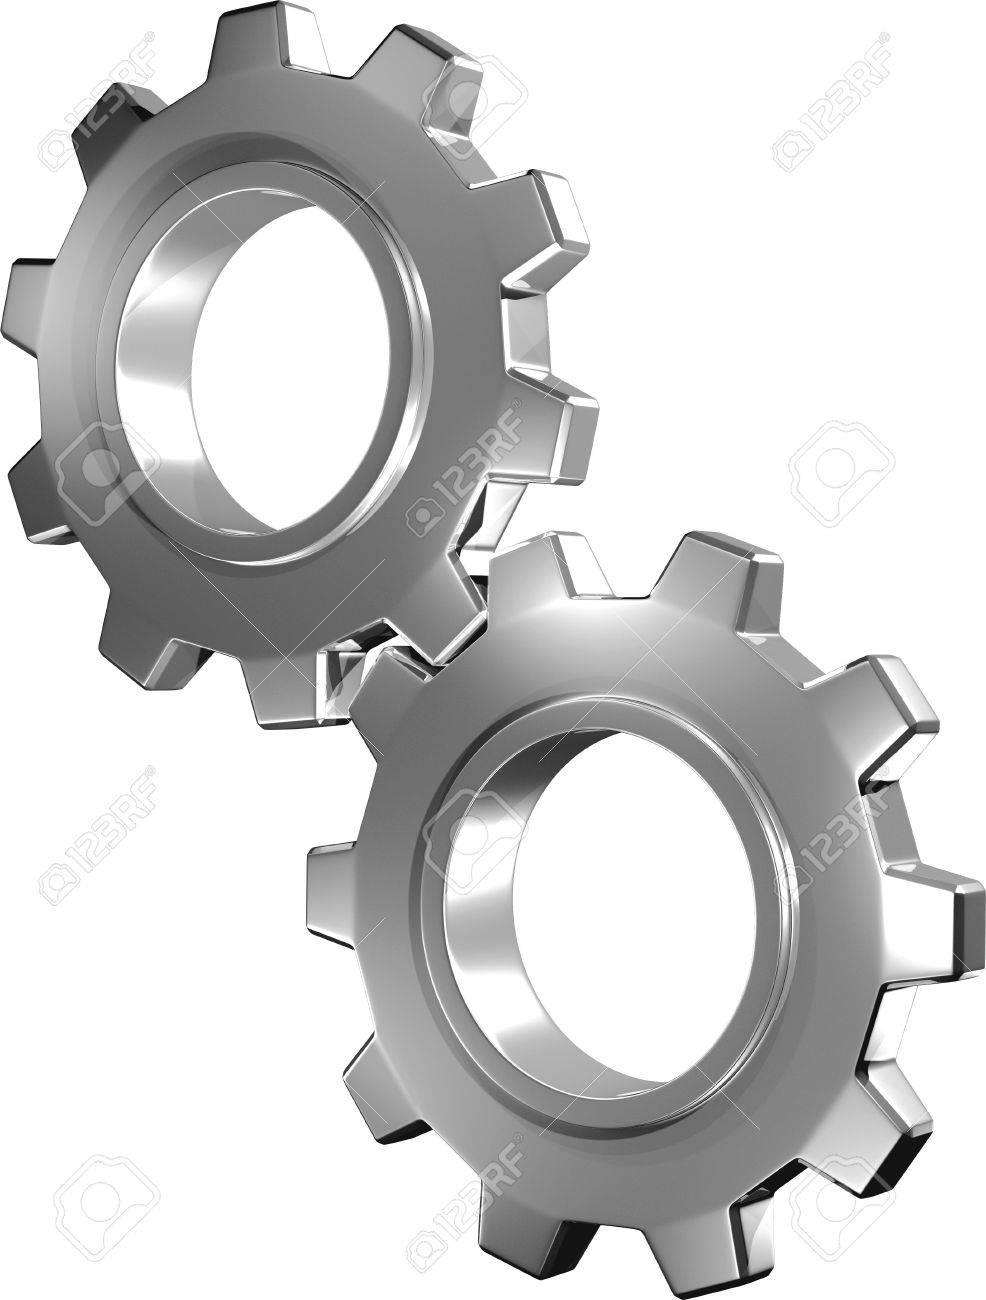 3D Metallic Gears In Motion Stock Photo - 6019650